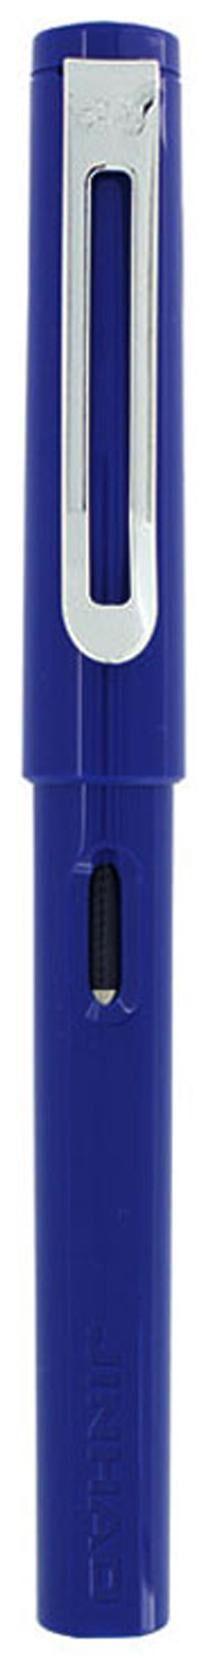 Jinhao 599 Fountain Pen - Gloss Blue And Chrome Clip